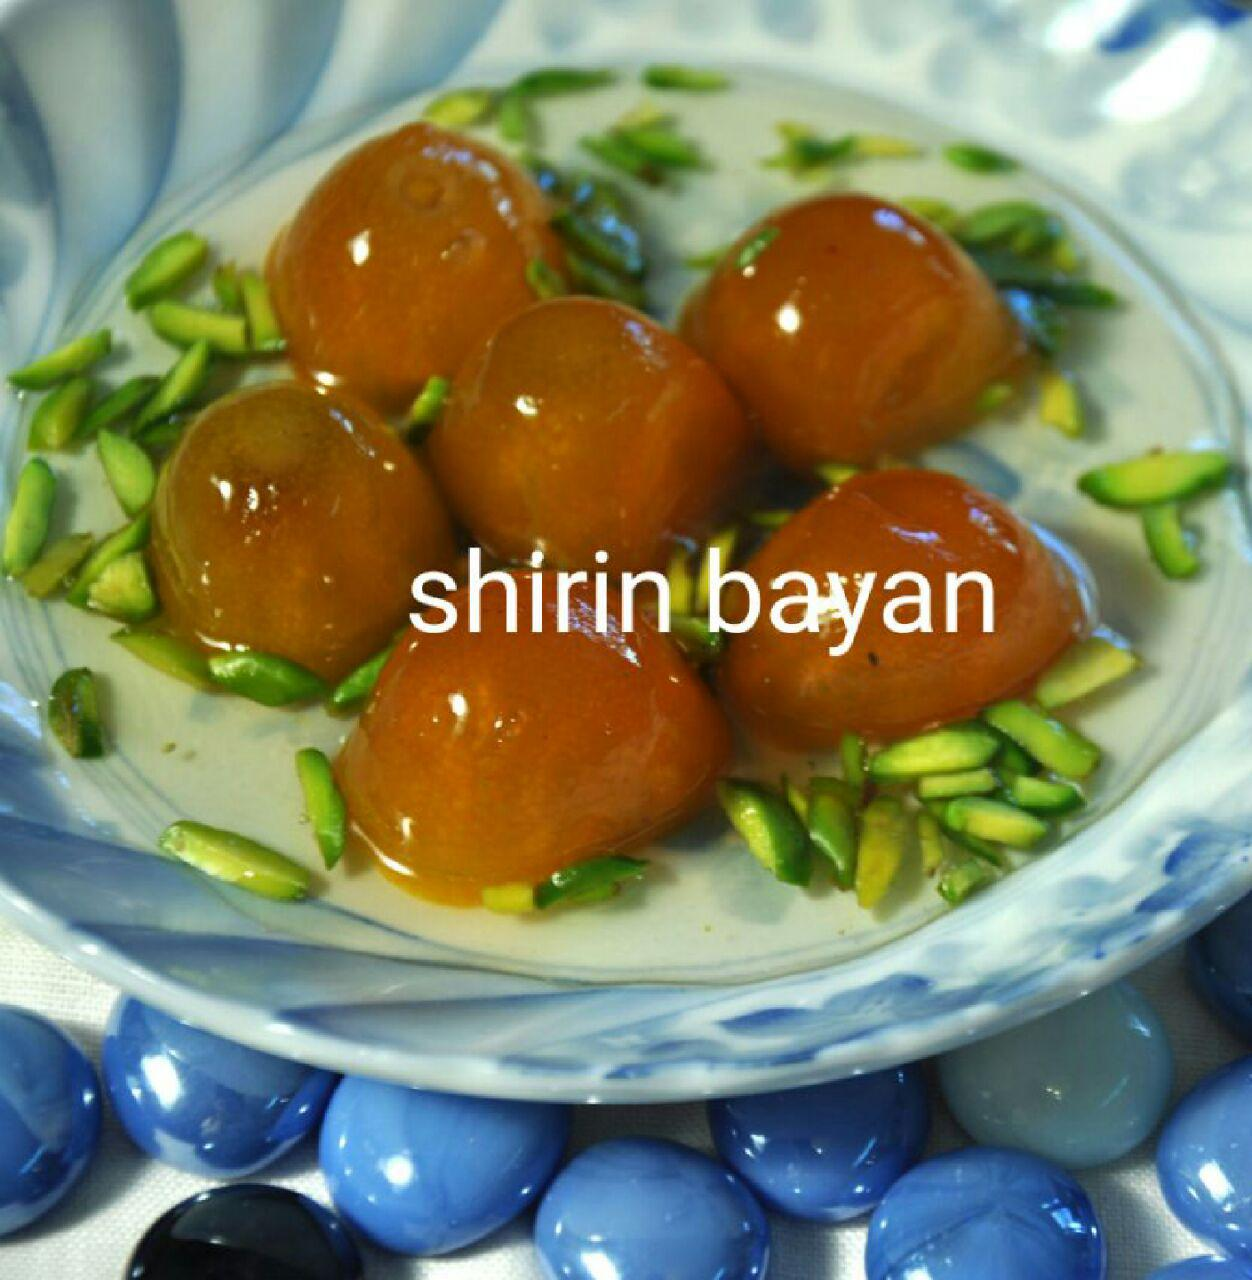 مربای کام کوات یا پرتقال تزئینی